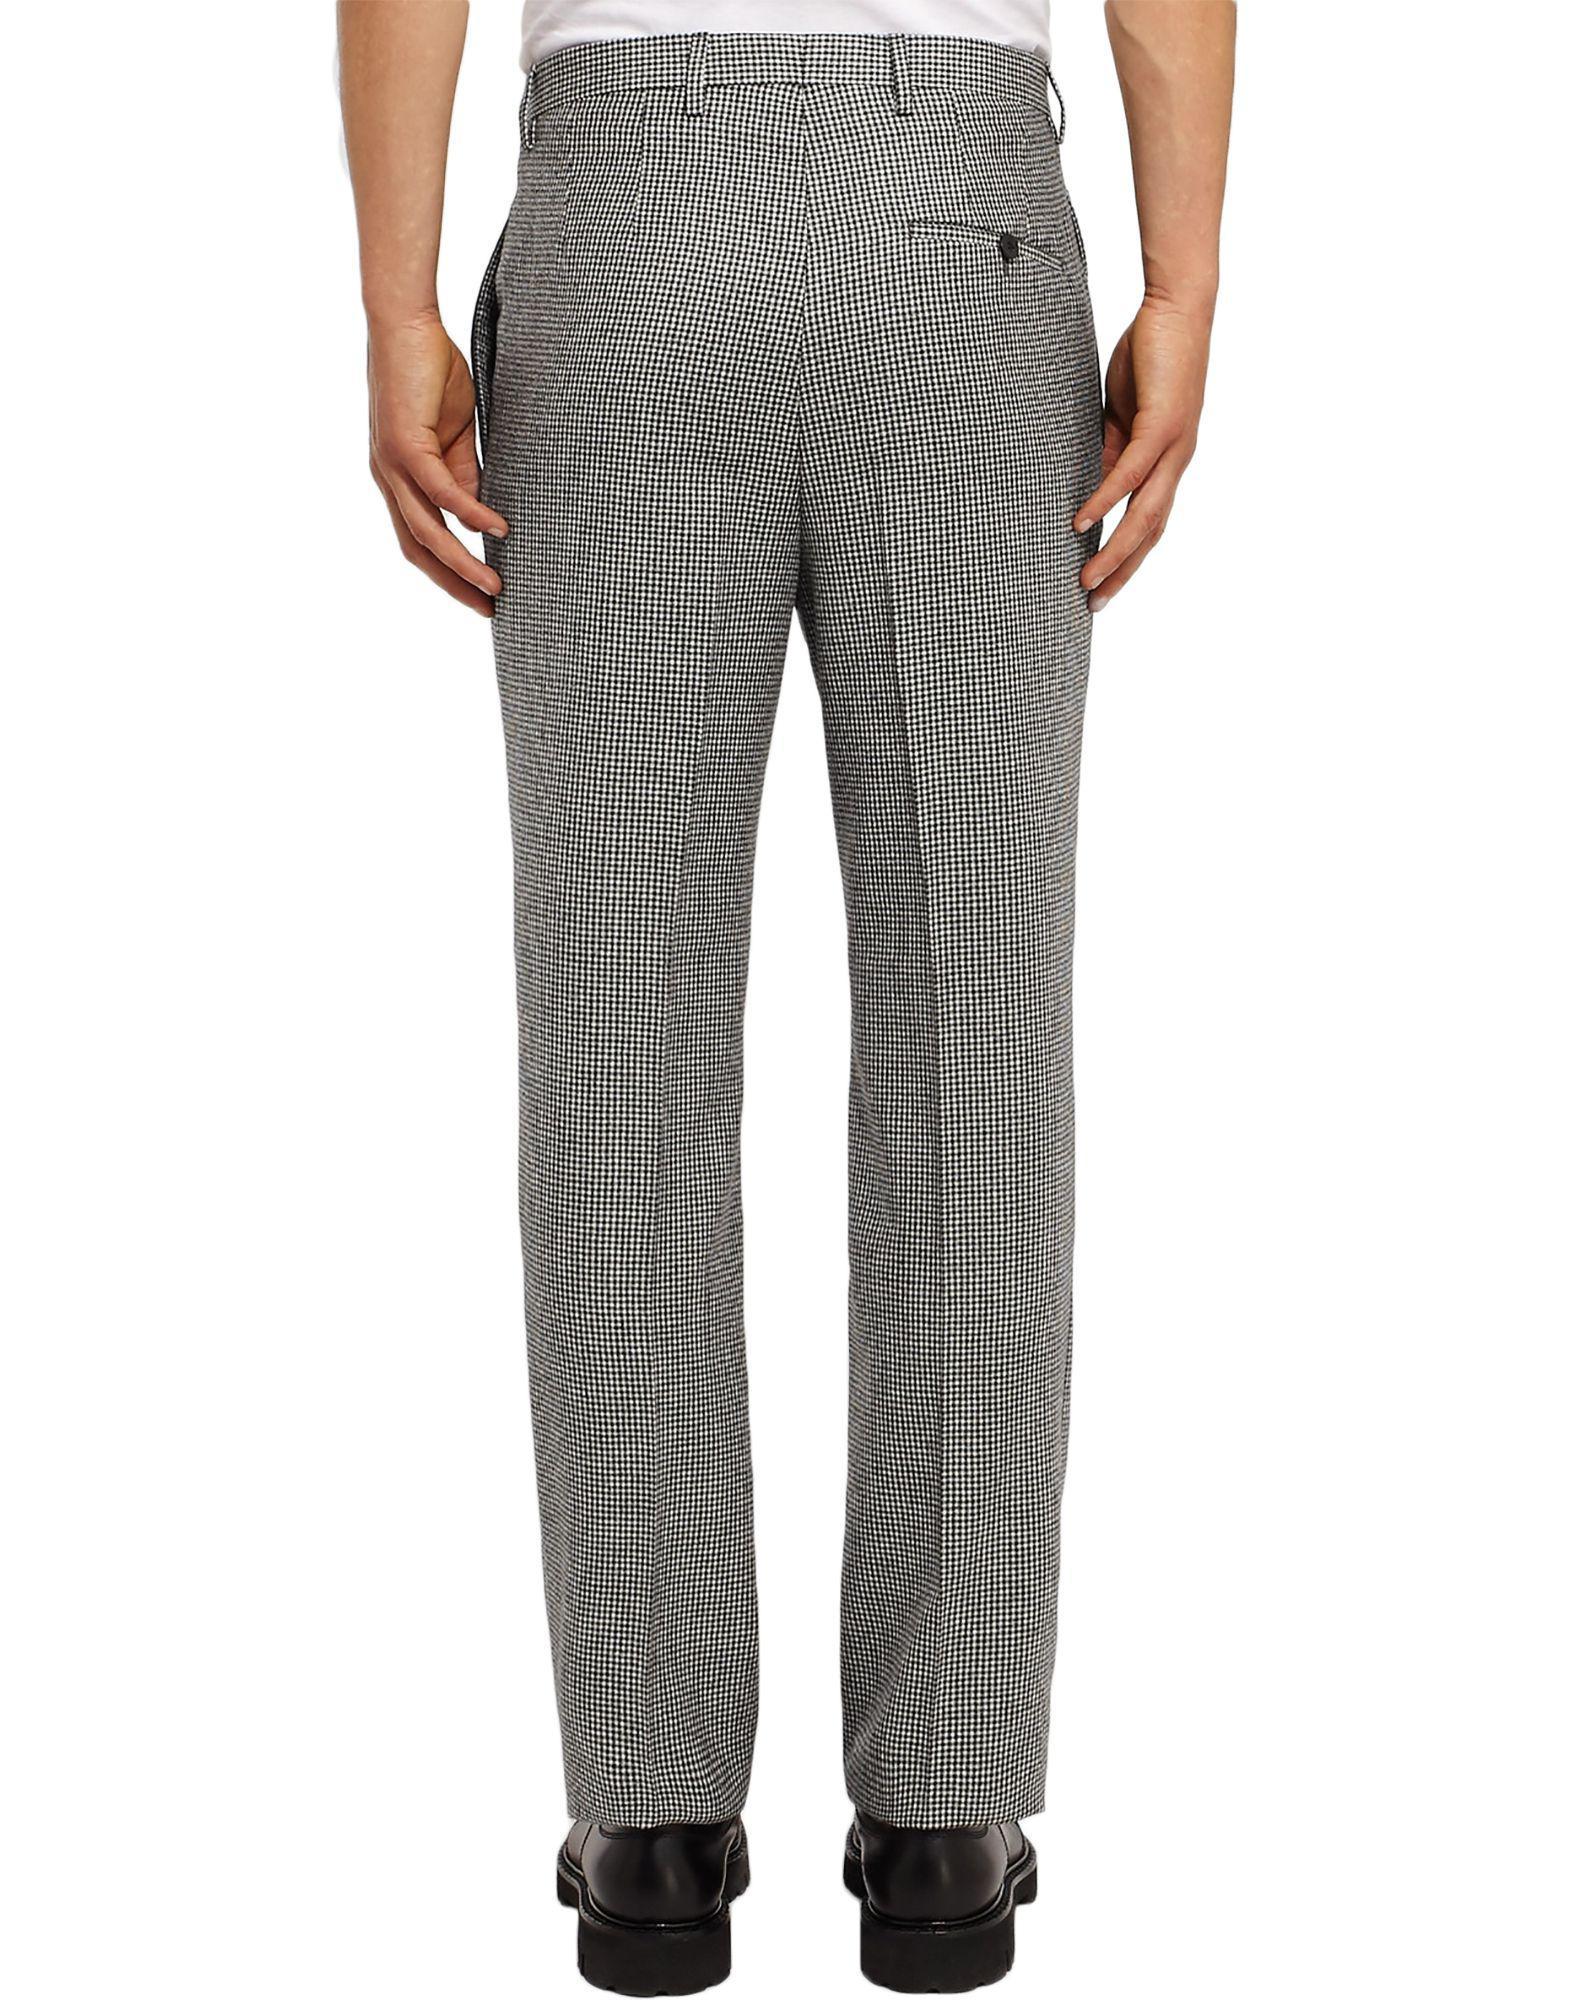 Lanvin Wool Casual Pants in Black for Men